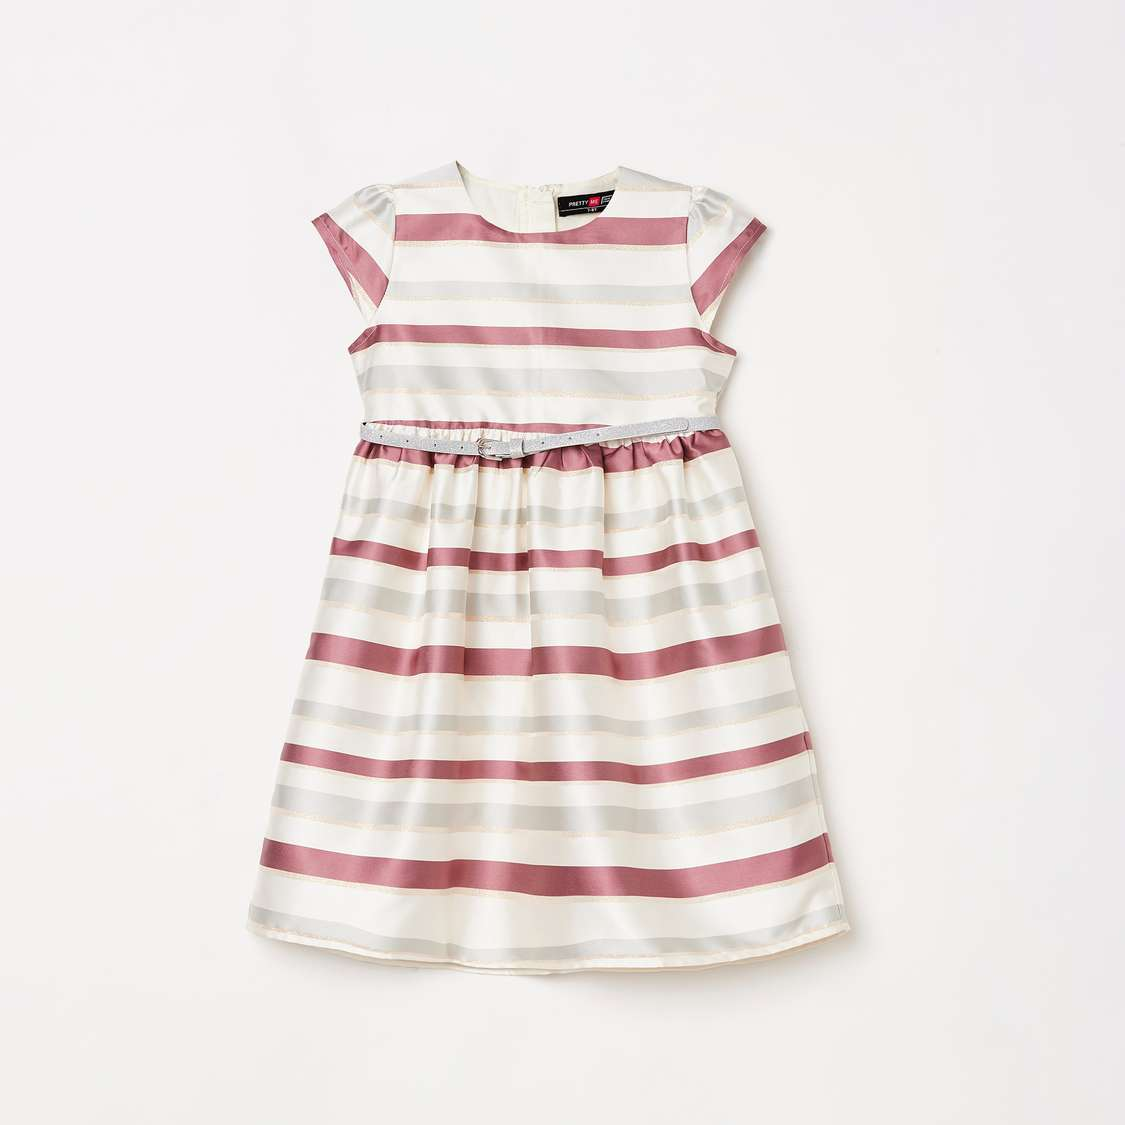 8.PRETTY ME Girls Striped A-Line Dress